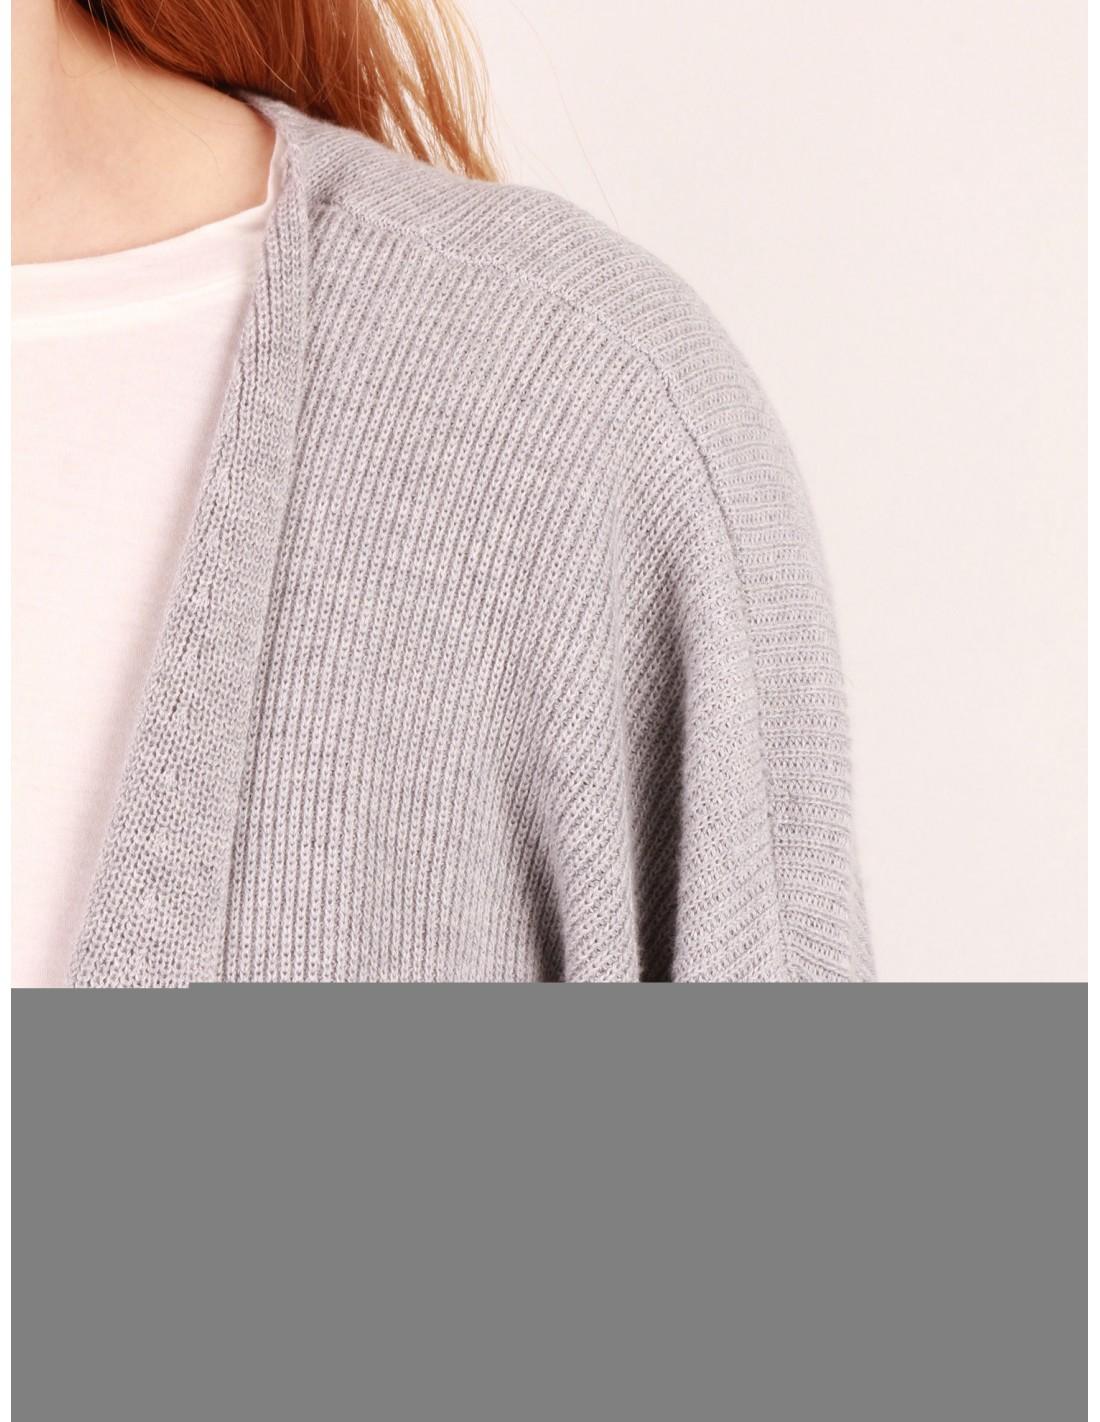 22cdabad475b femme-fine-edge-long-gilet-cardigan-peignoir-coton-gris.jpg